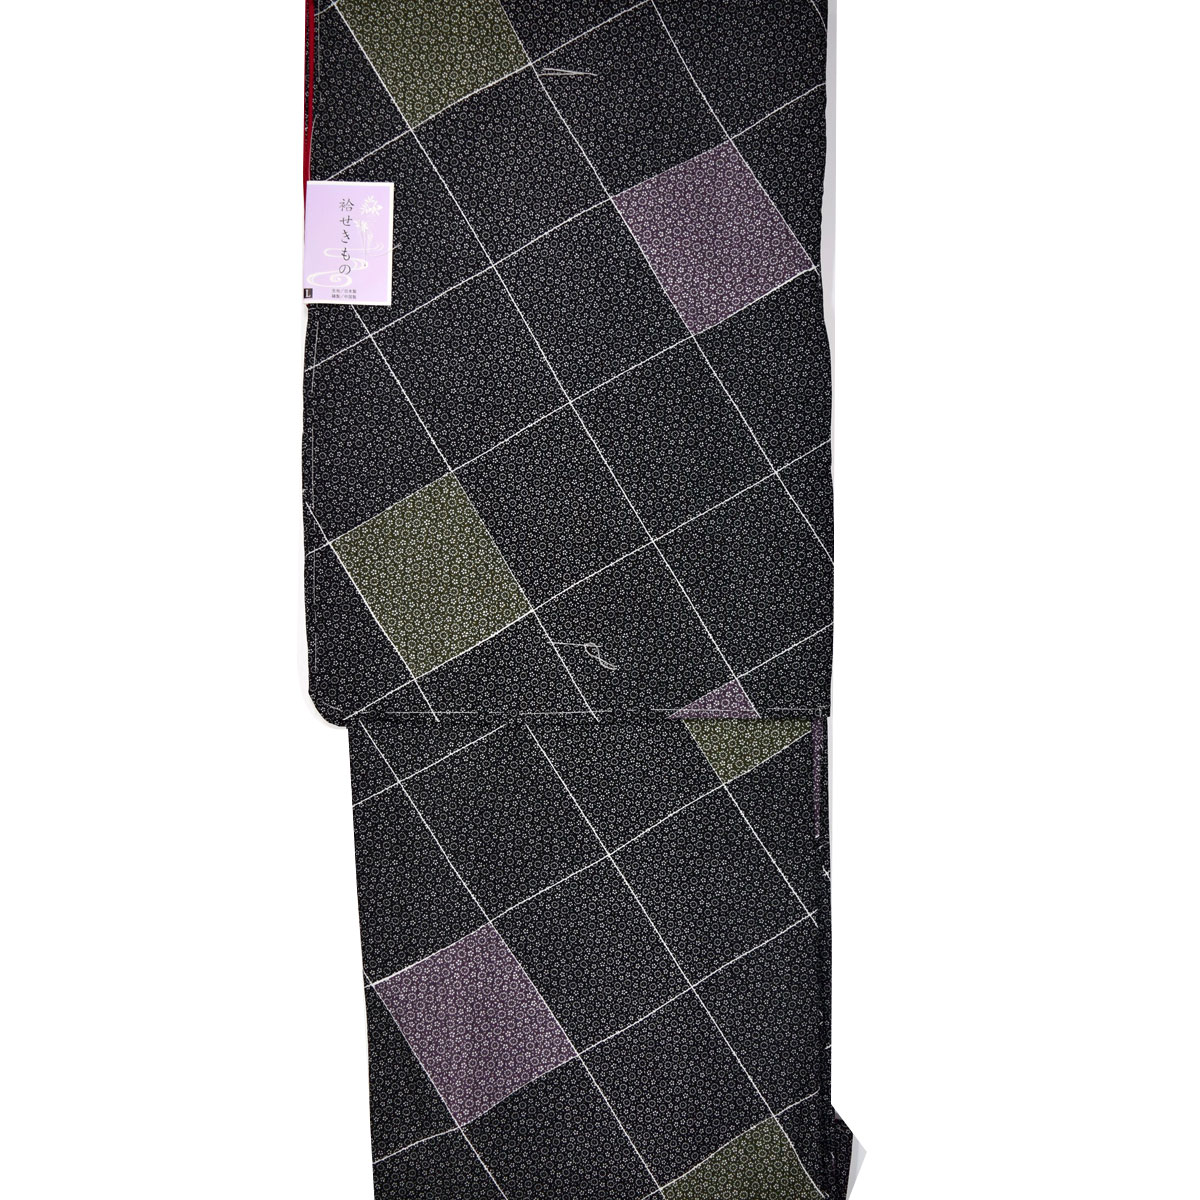 【L寸】上質生地仕立て上がり袷洗える着物【単品】番号c902-87 kimono washable【2019_9ss】